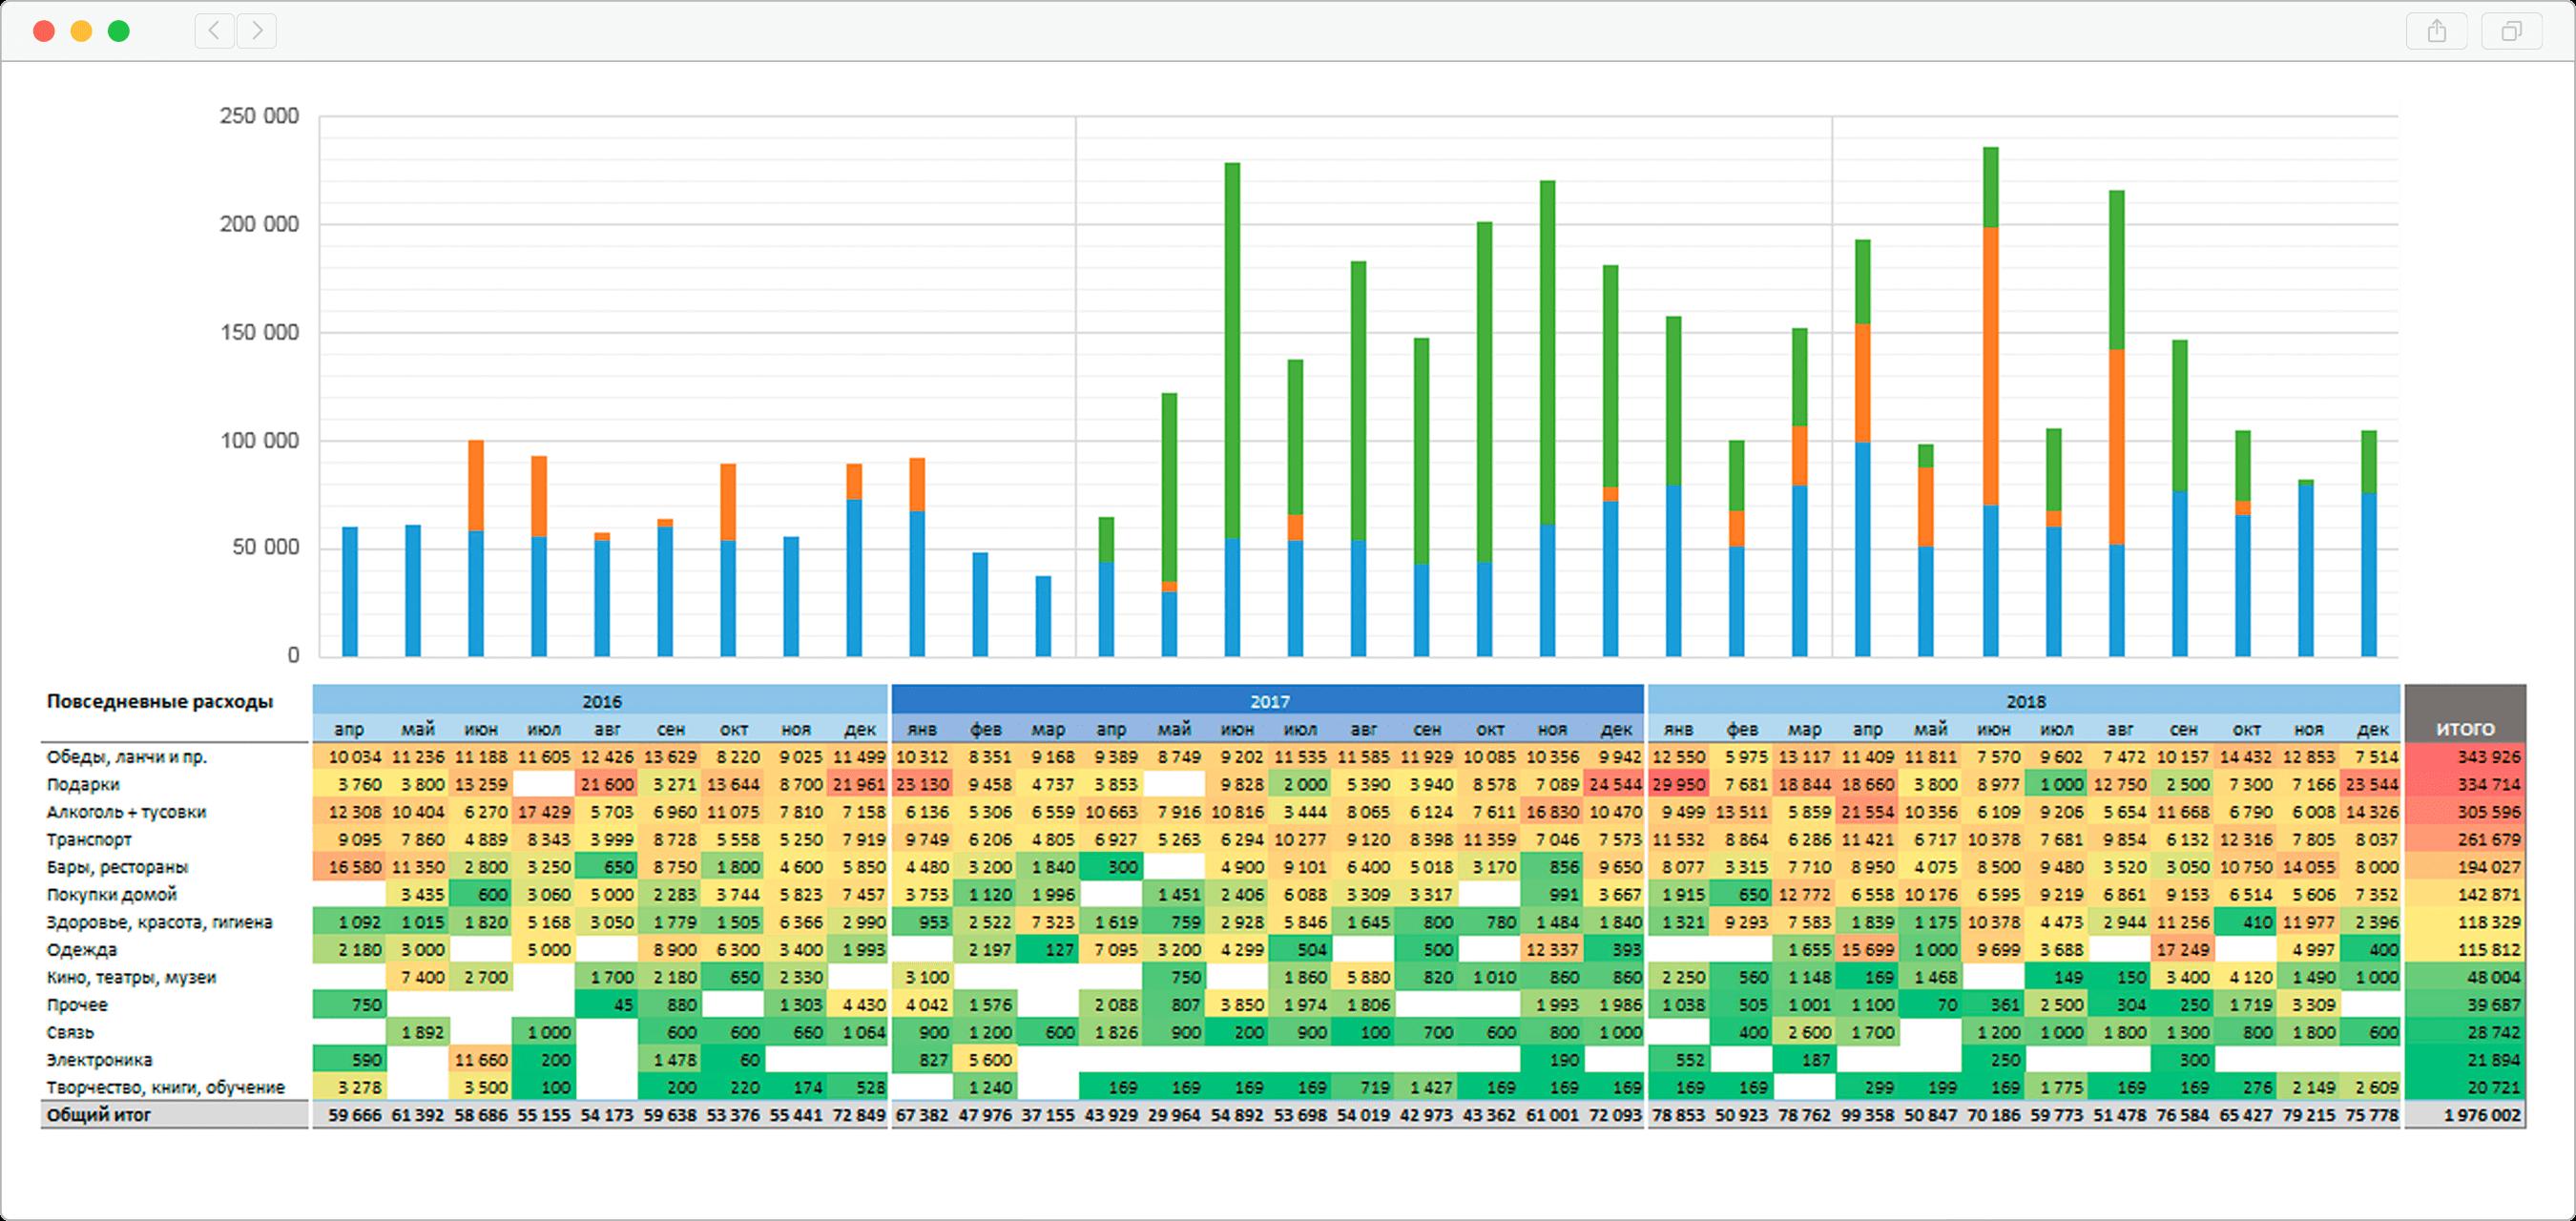 Структура расходов за 1000 дней эксперимента в разрезе по месяцам